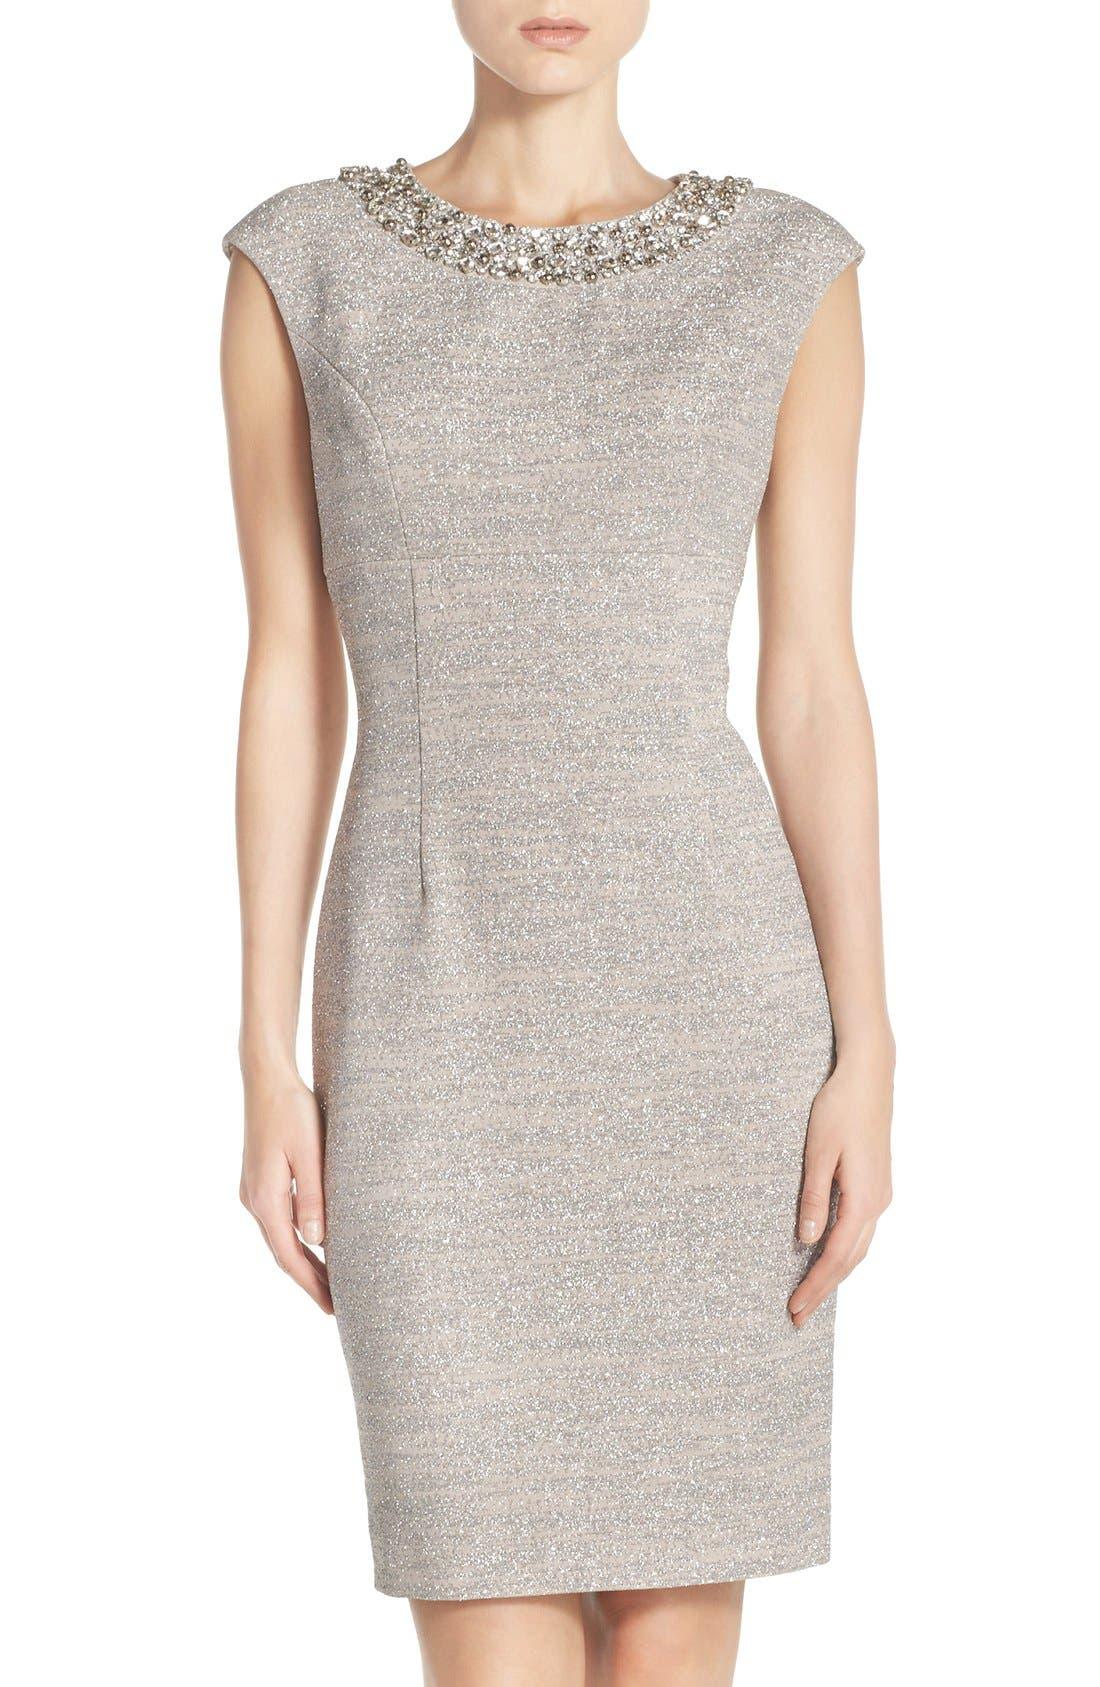 ELIZA J Embellished Sparkle Knit Sheath Dress